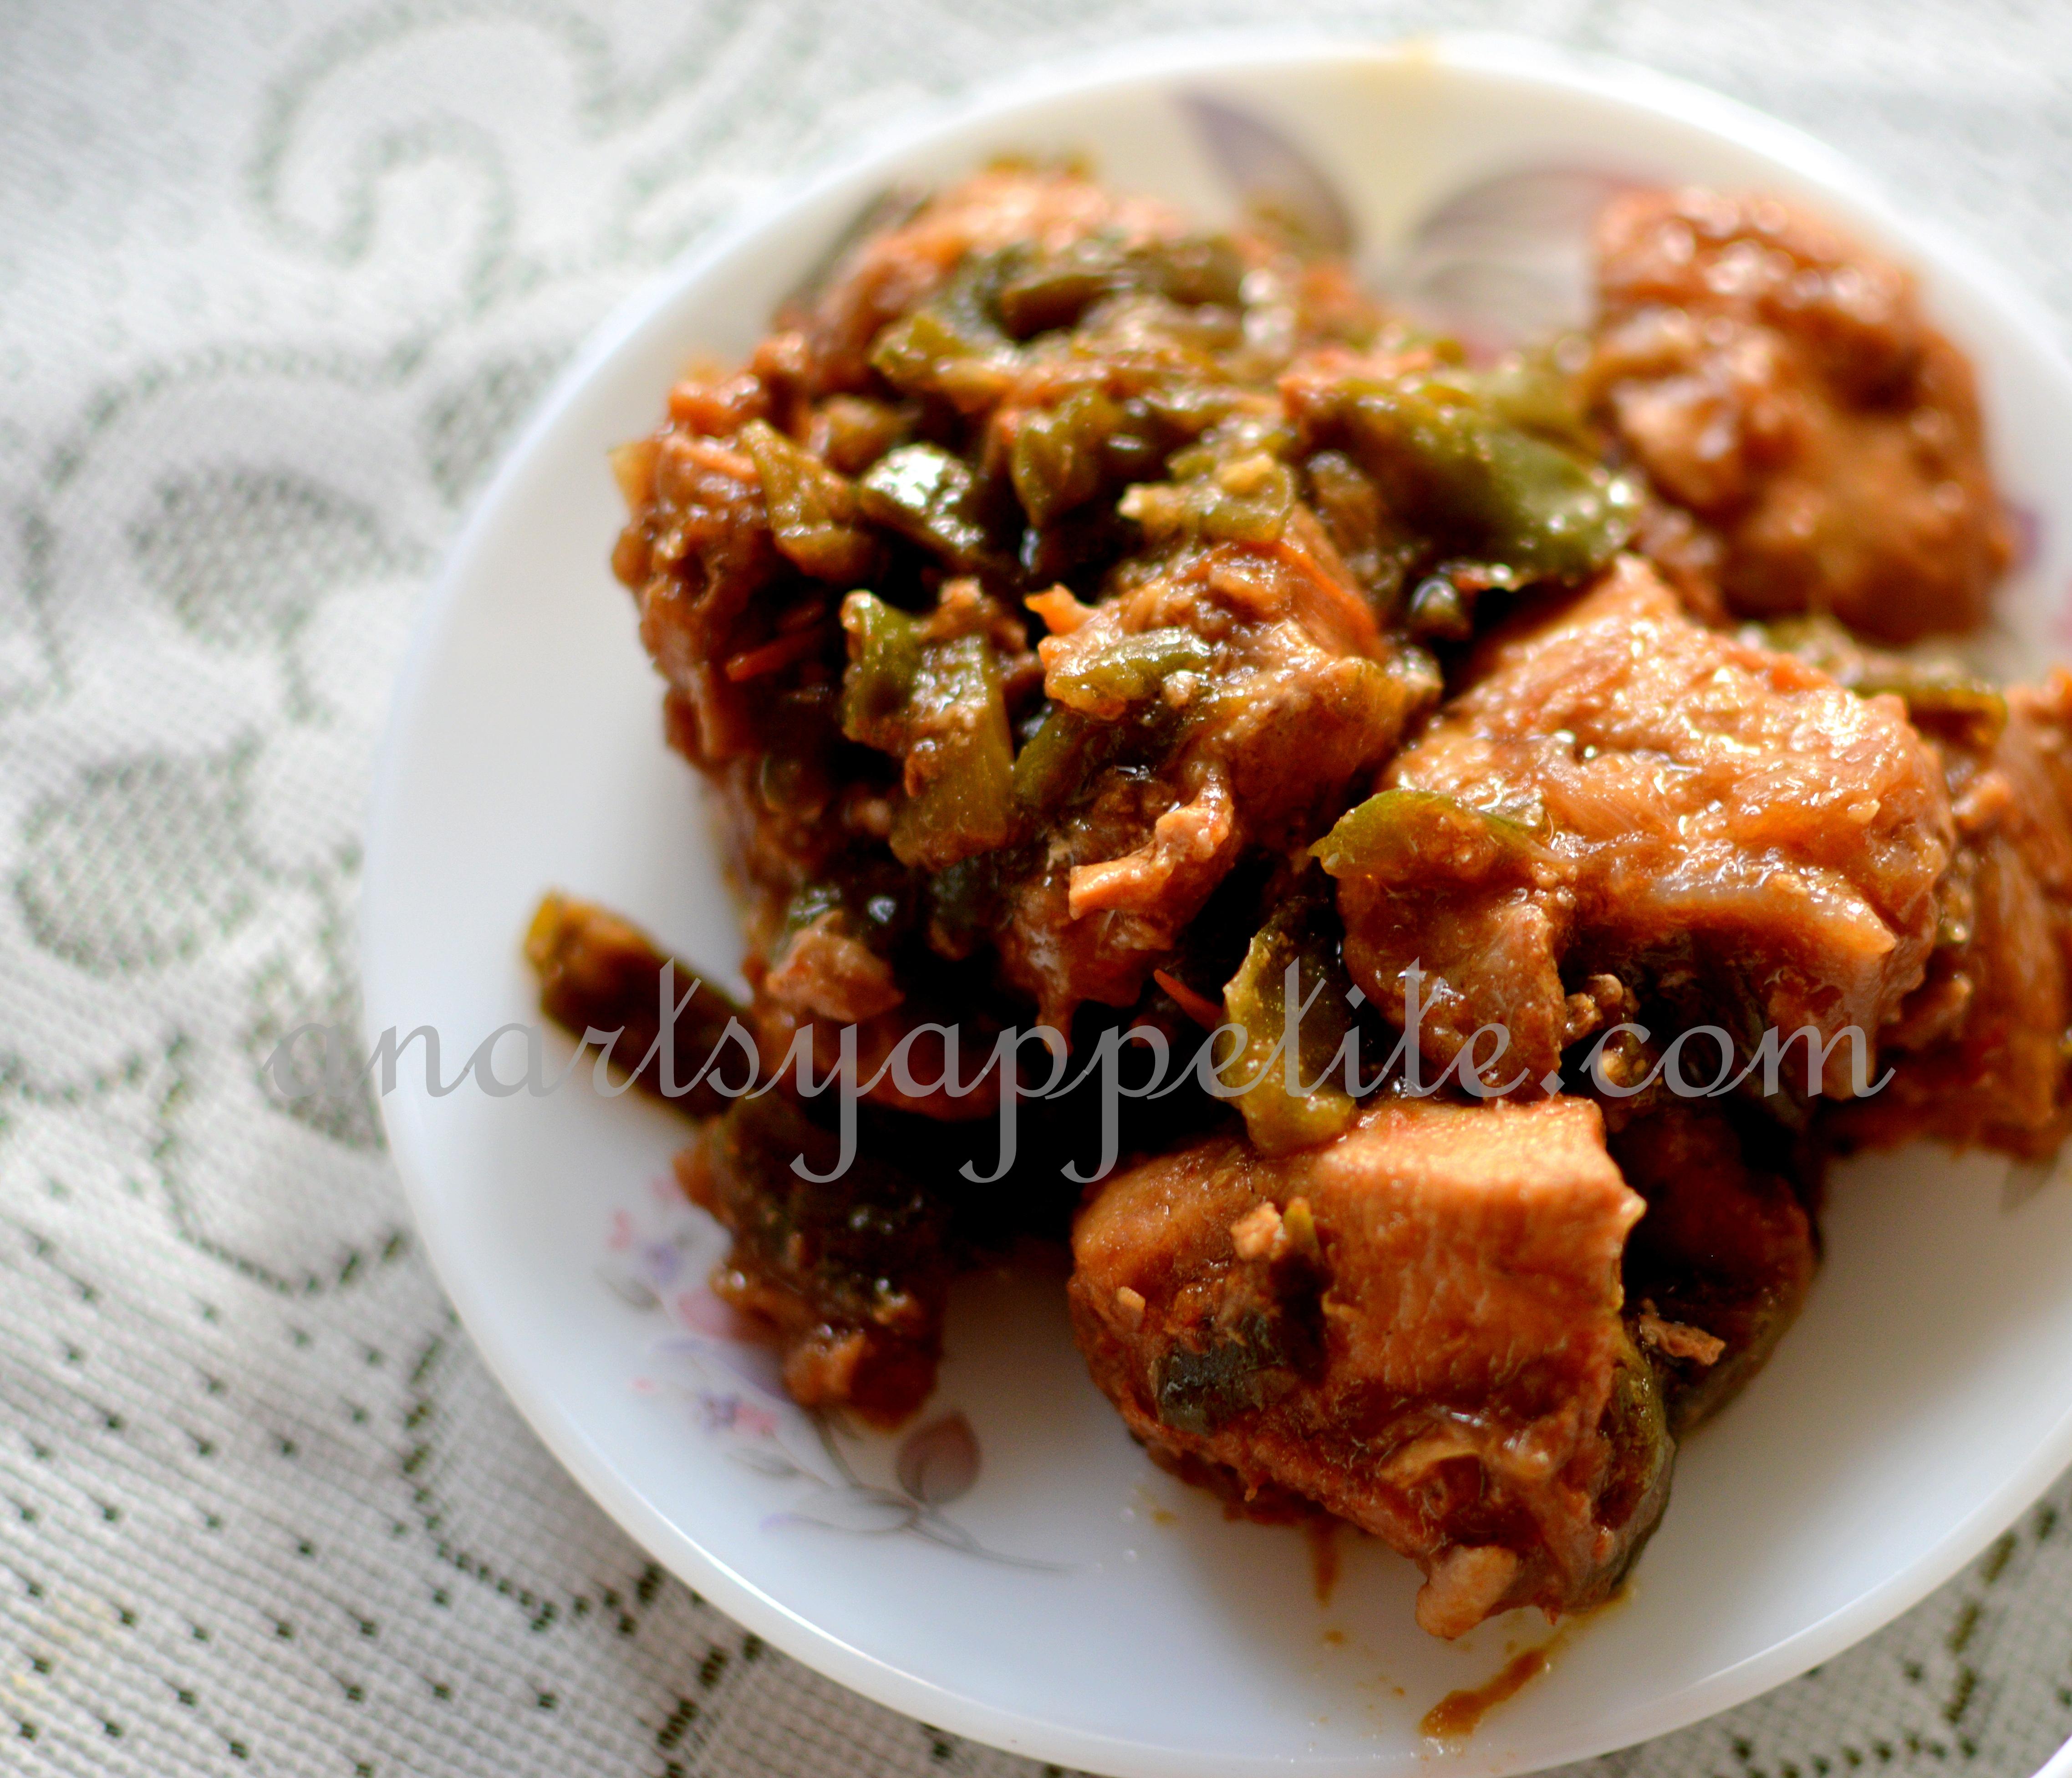 Winter in kolkata i homemade food and stories an artsy appetite food in kolkata homemade recipes bengali food recipes food in bengali homes forumfinder Choice Image